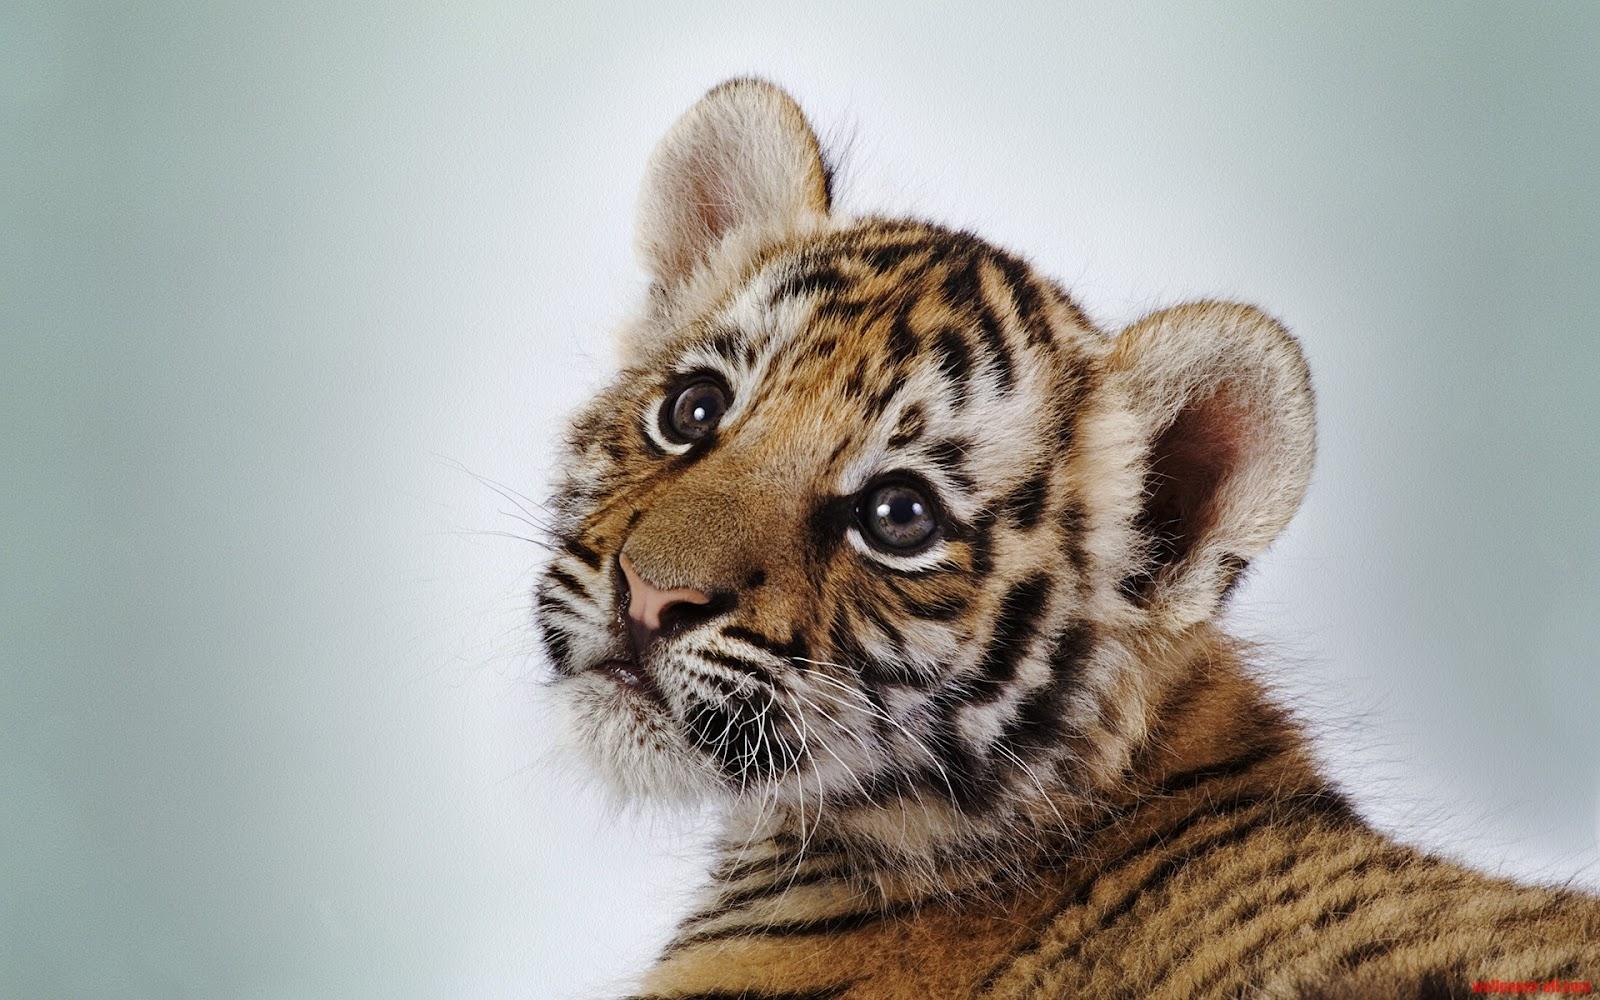 Wallpaper Proslut Pictures Of Animals